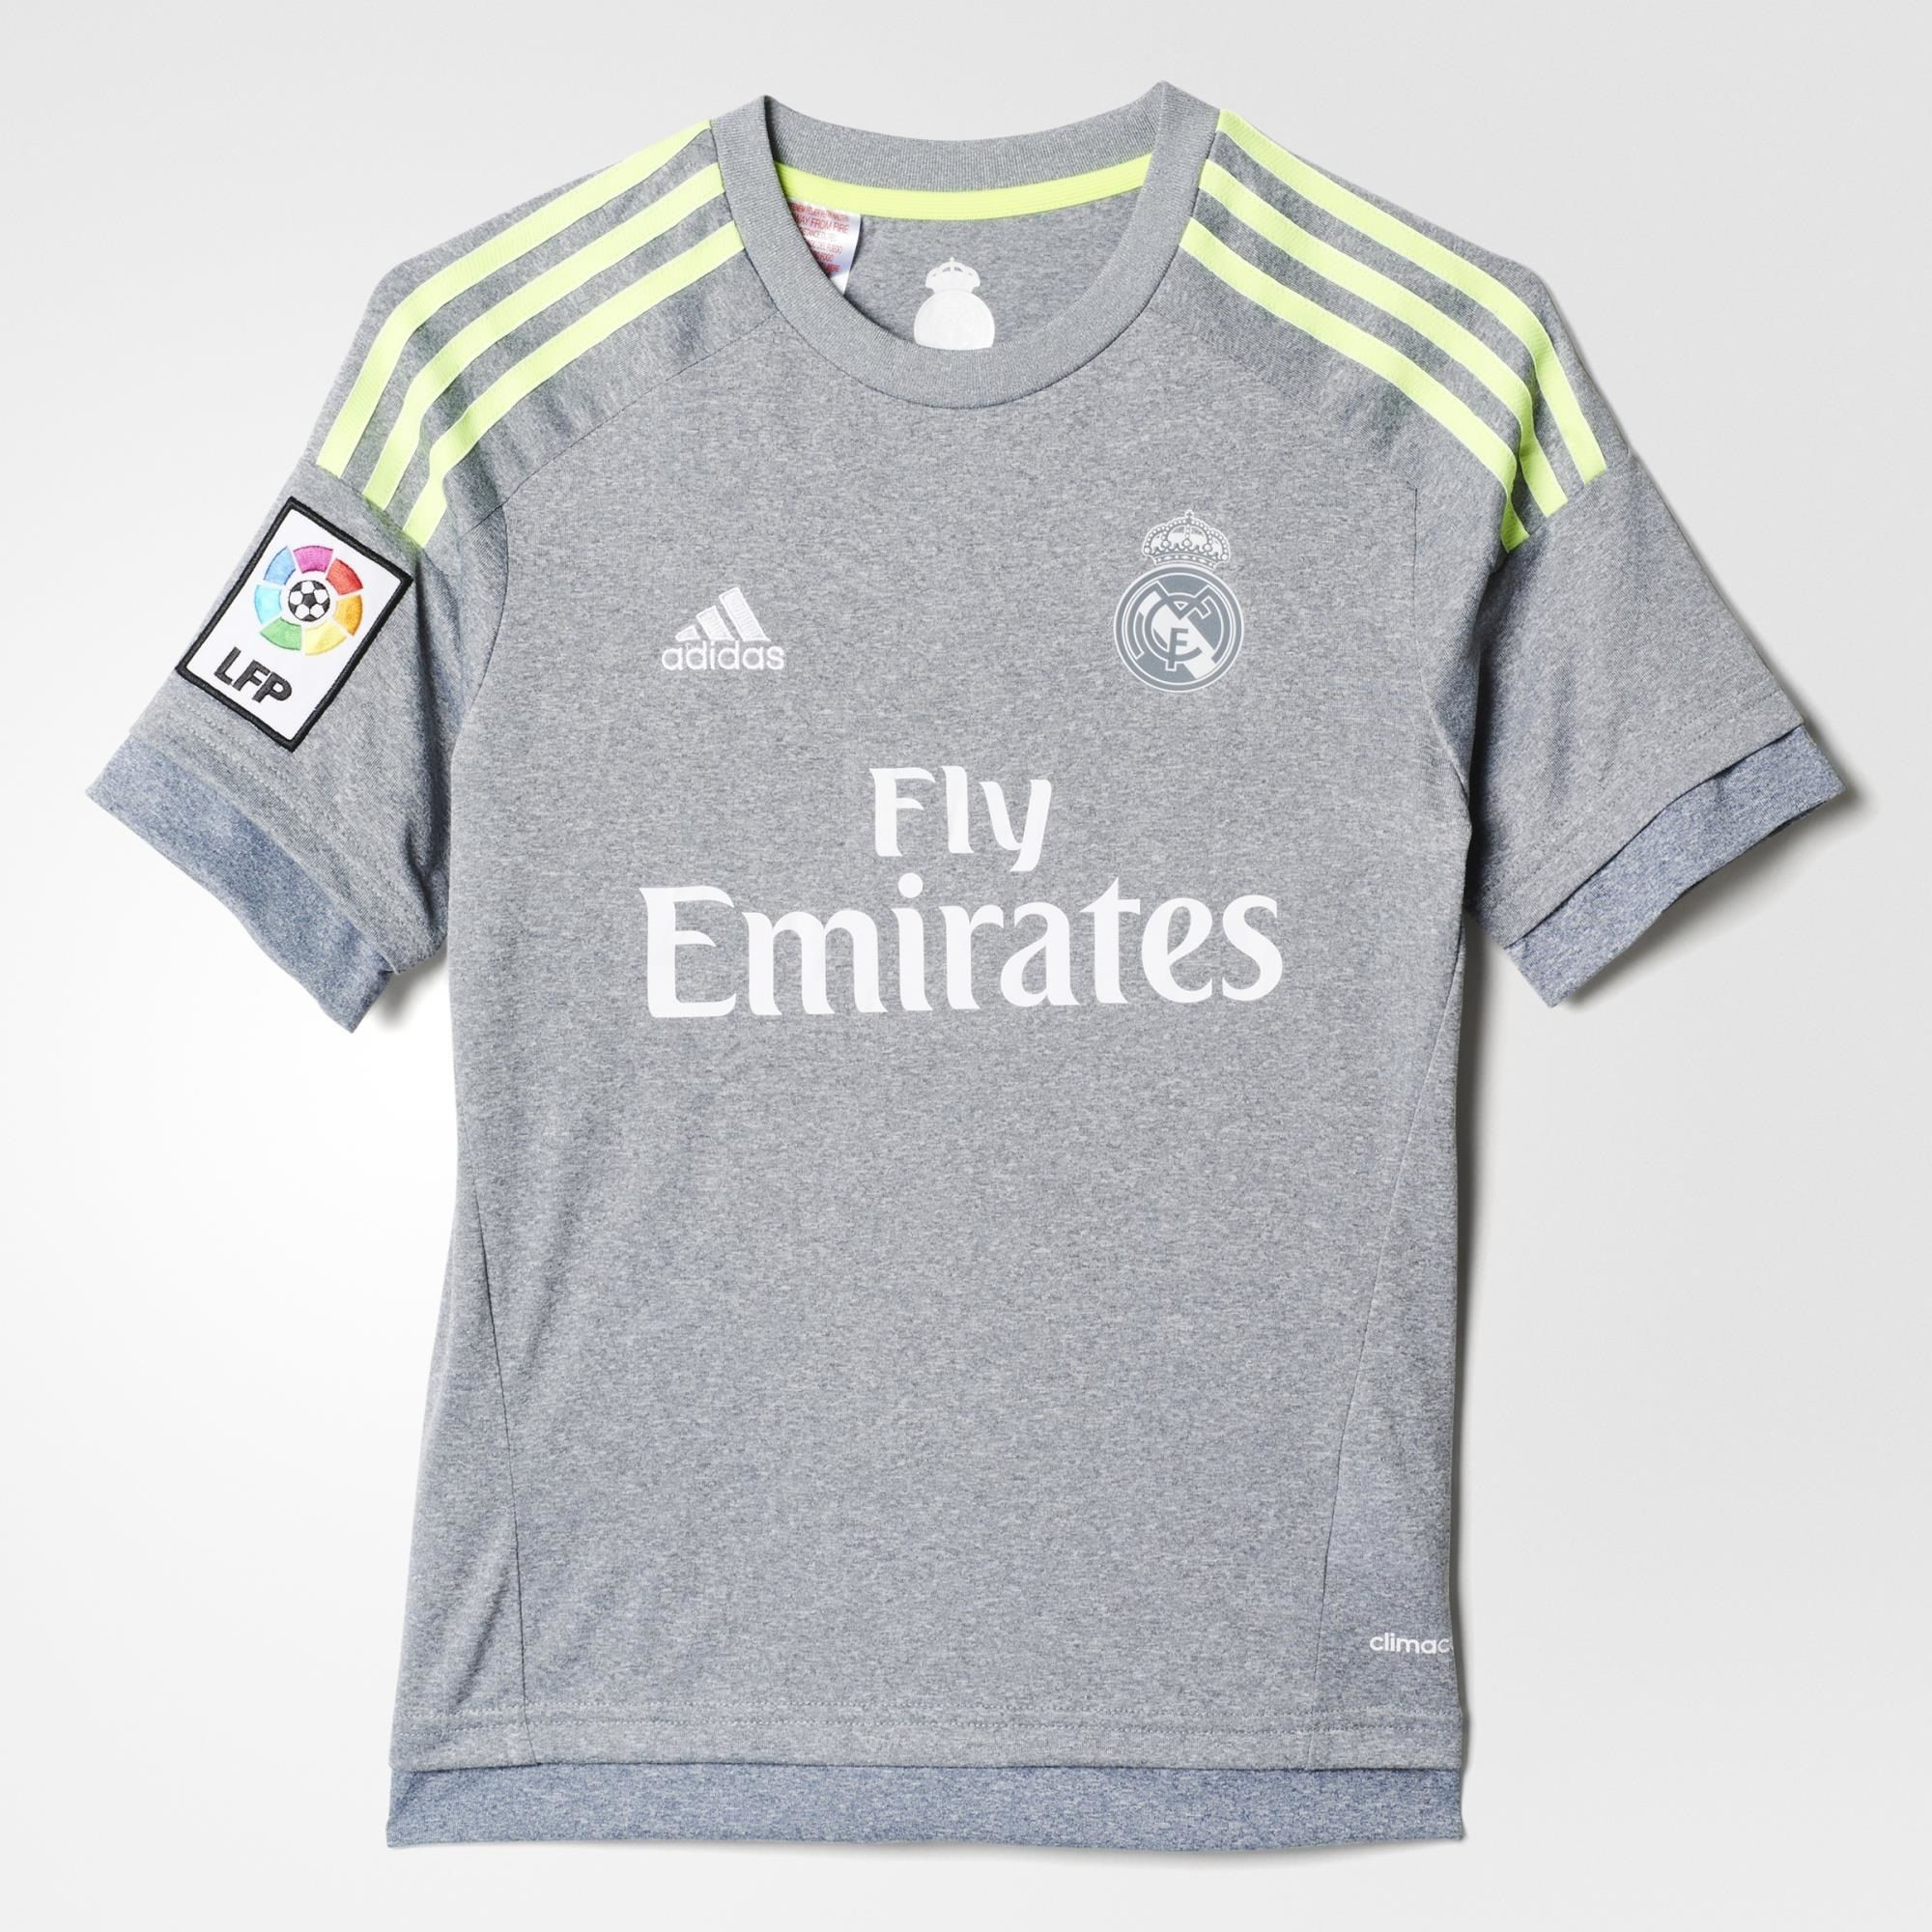 best website 00010 083fc adidas Real Madrid Away Jsy Youth 2015/16 - Grey